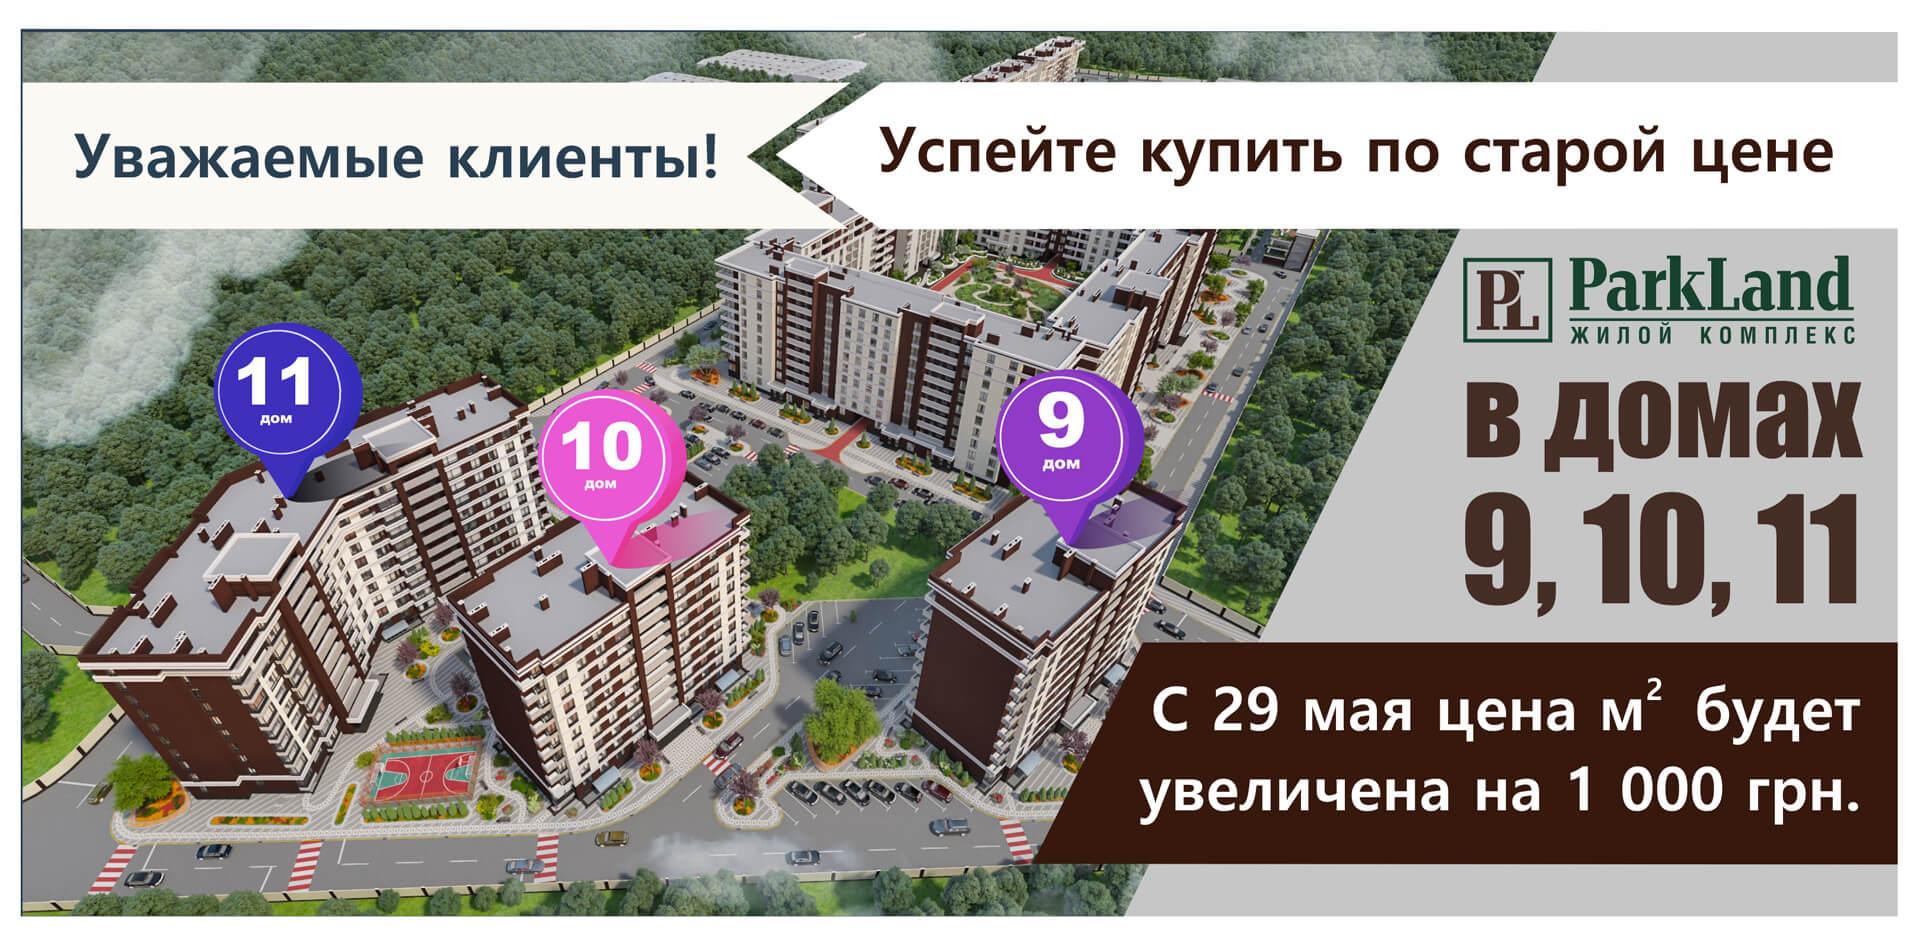 news-2905-ru